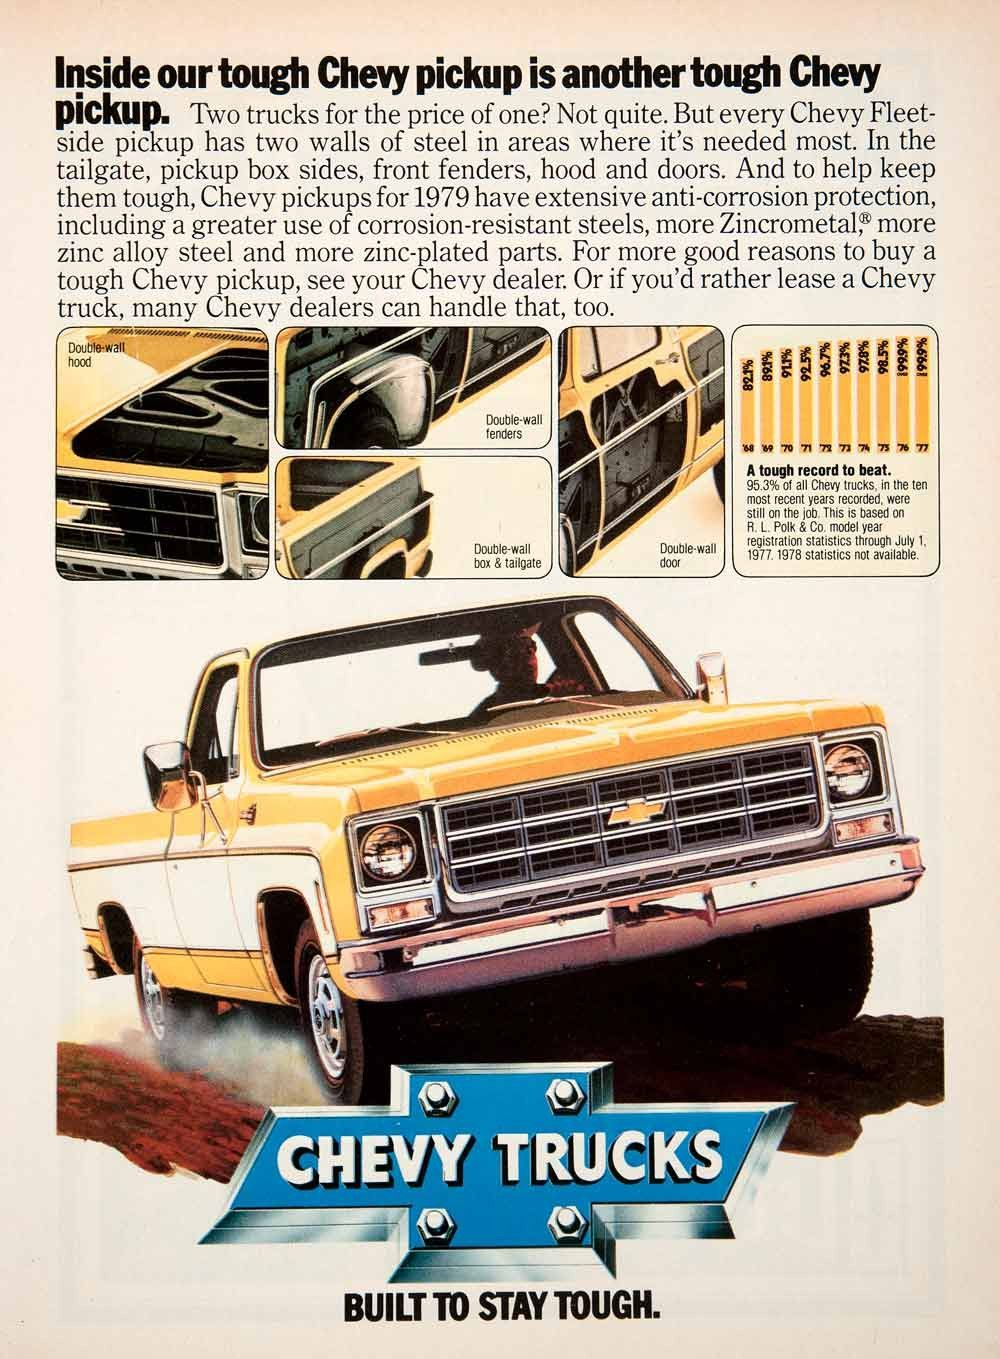 1979 Ad Chevy Trucks Pickup Tough Fleetside Zincrometal